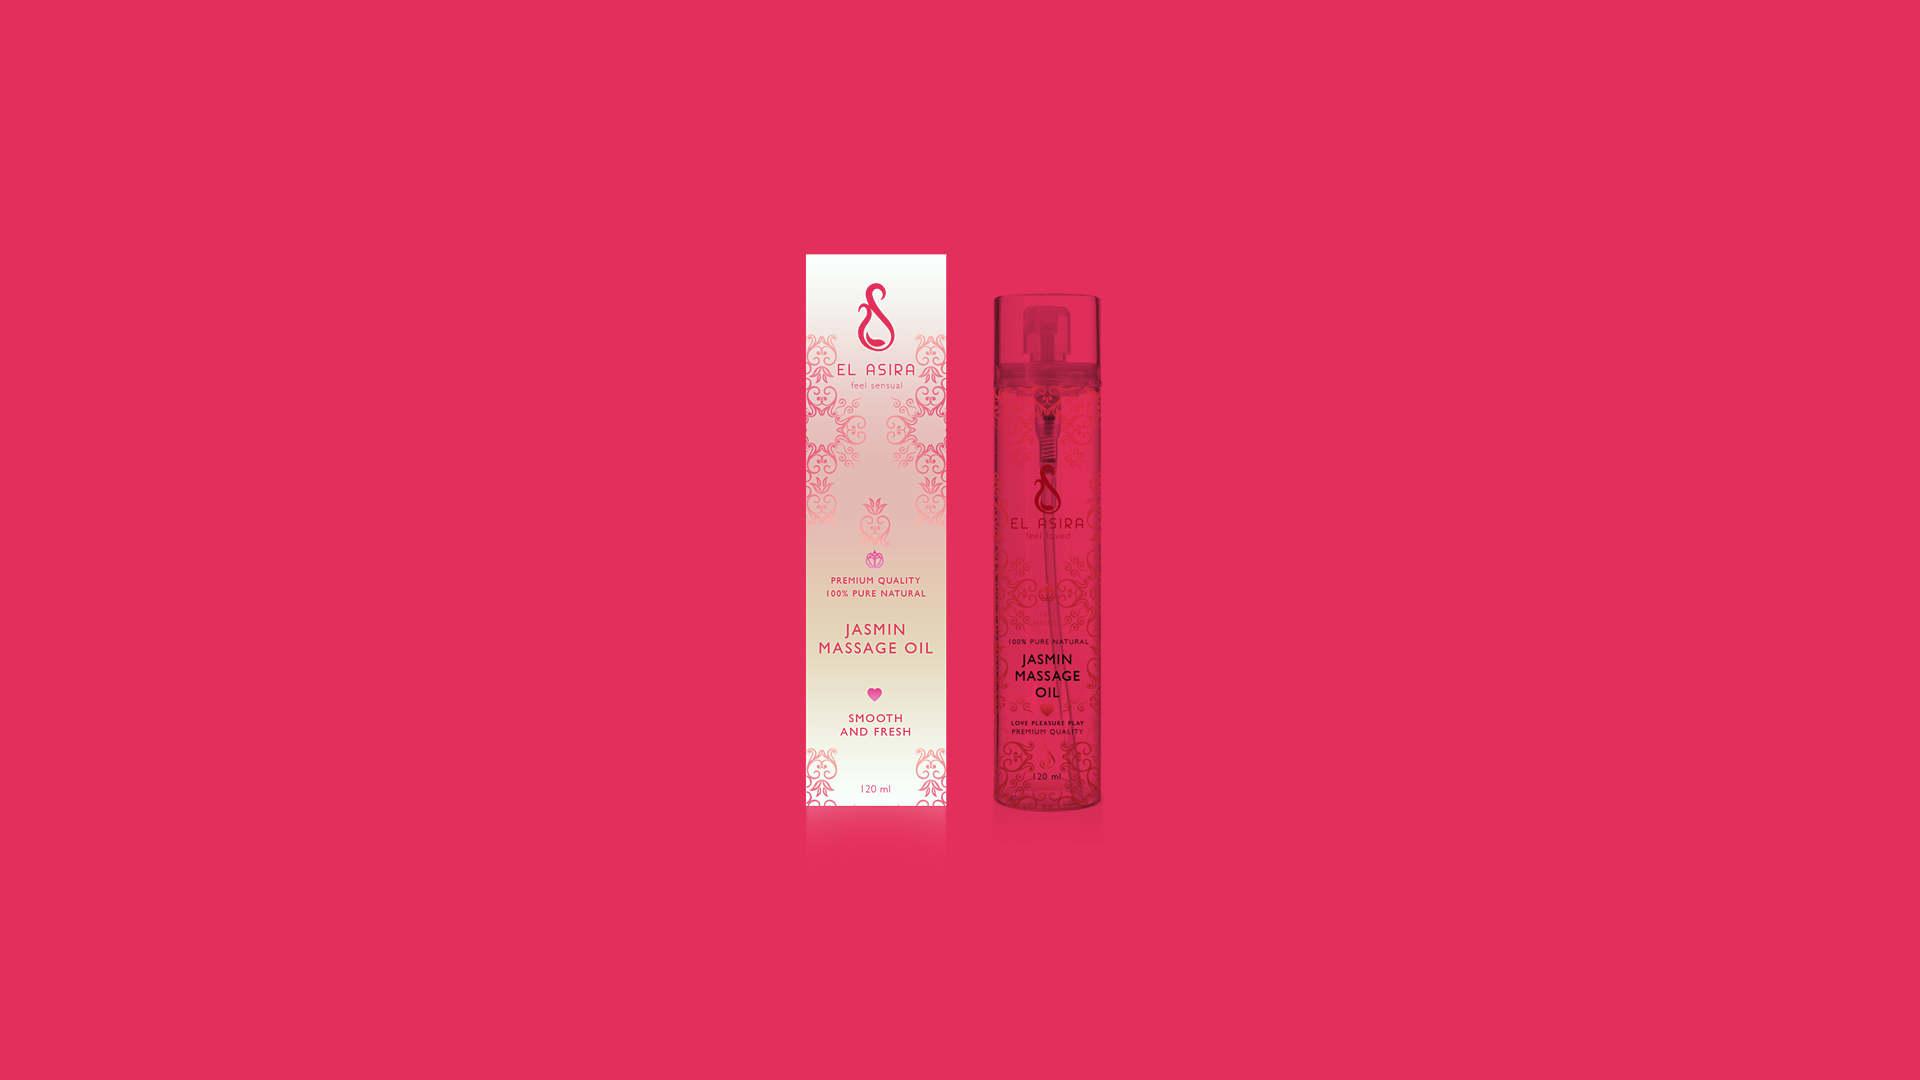 Sensual Pleasure Brand Design - Sham Ramessar